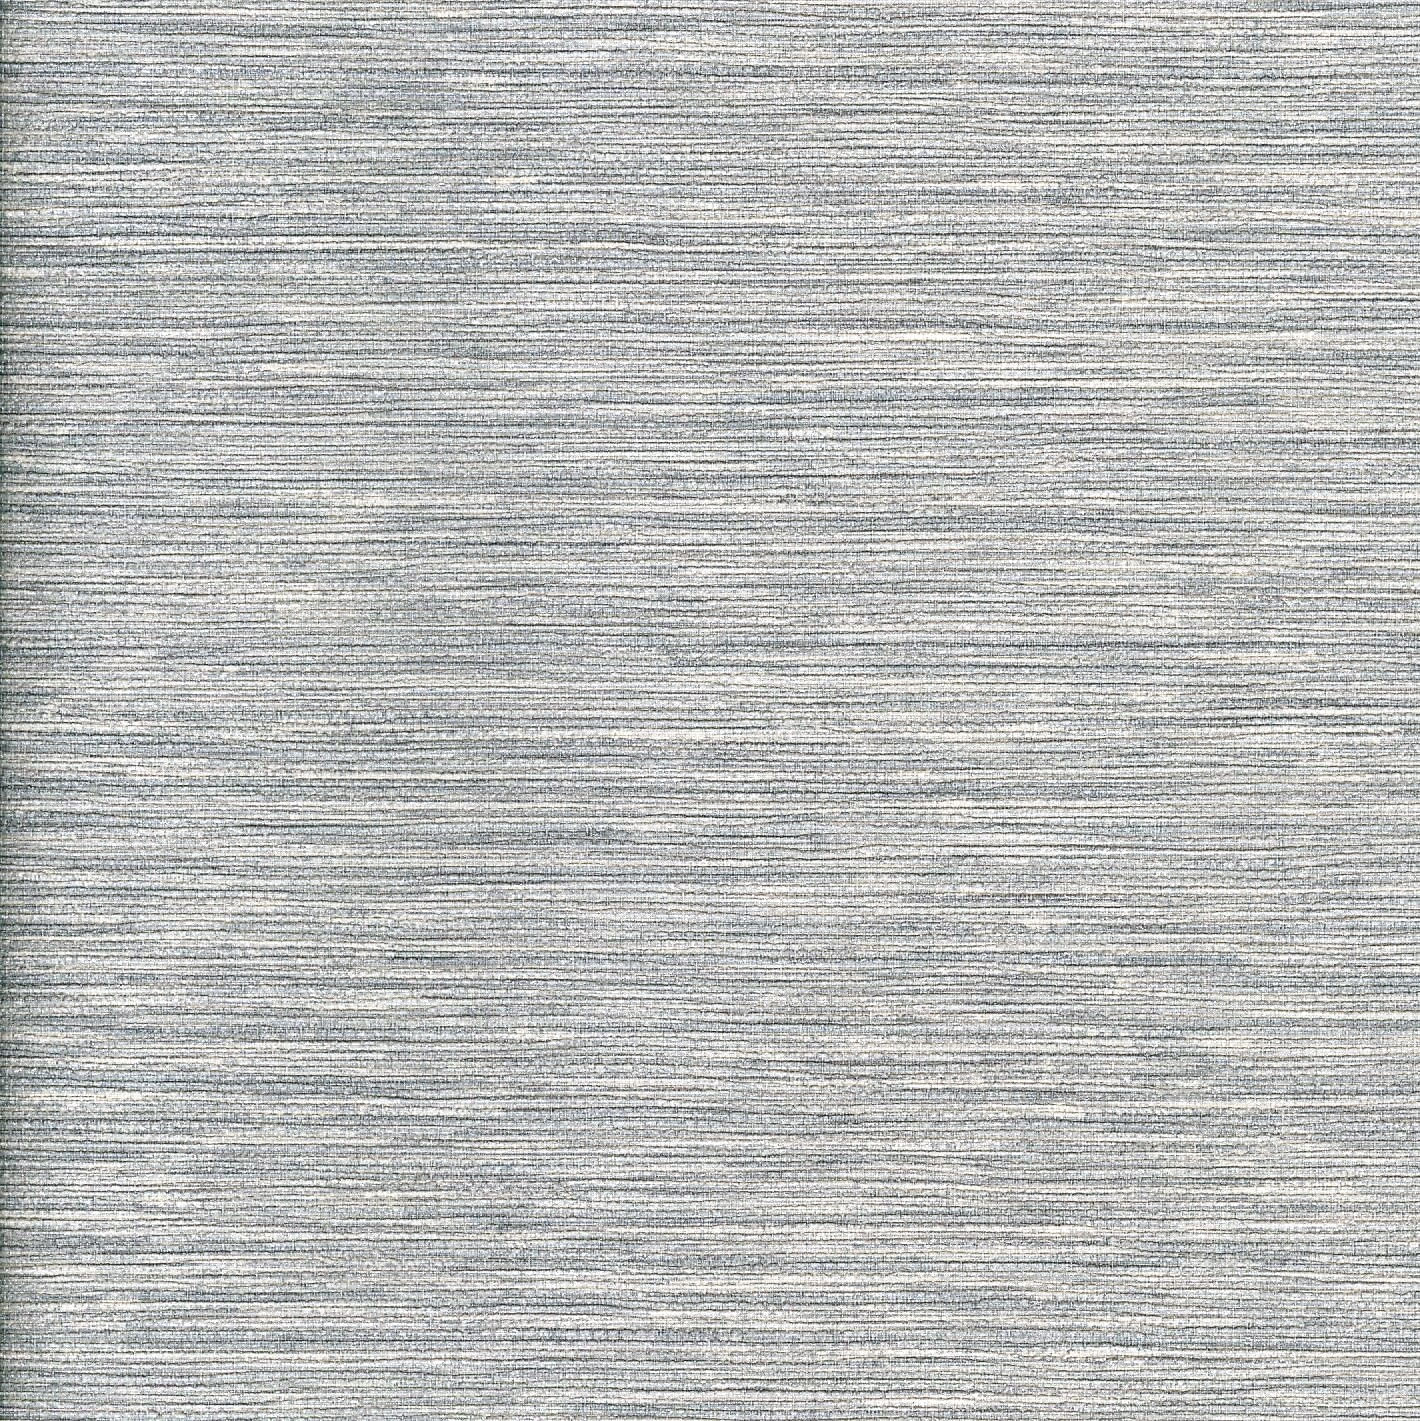 Papel de Parede Pure 2 Fio a Fio 187101 - Rolo: 10m x 0,53m